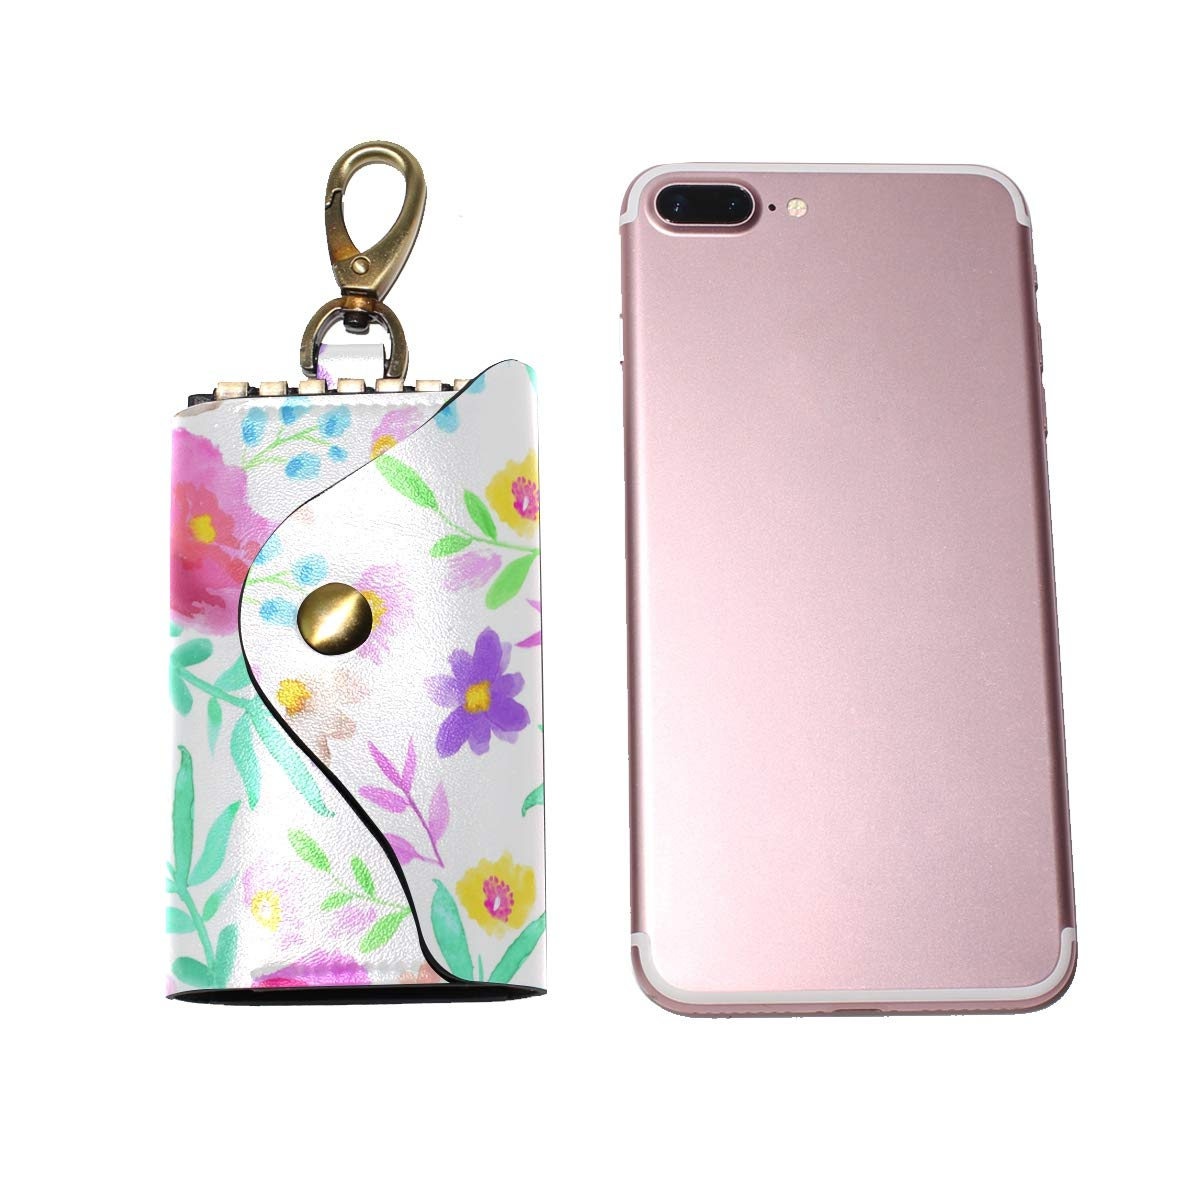 KEAKIA Watercolor Flower Leather Key Case Wallets Tri-fold Key Holder Keychains with 6 Hooks 2 Slot Snap Closure for Men Women